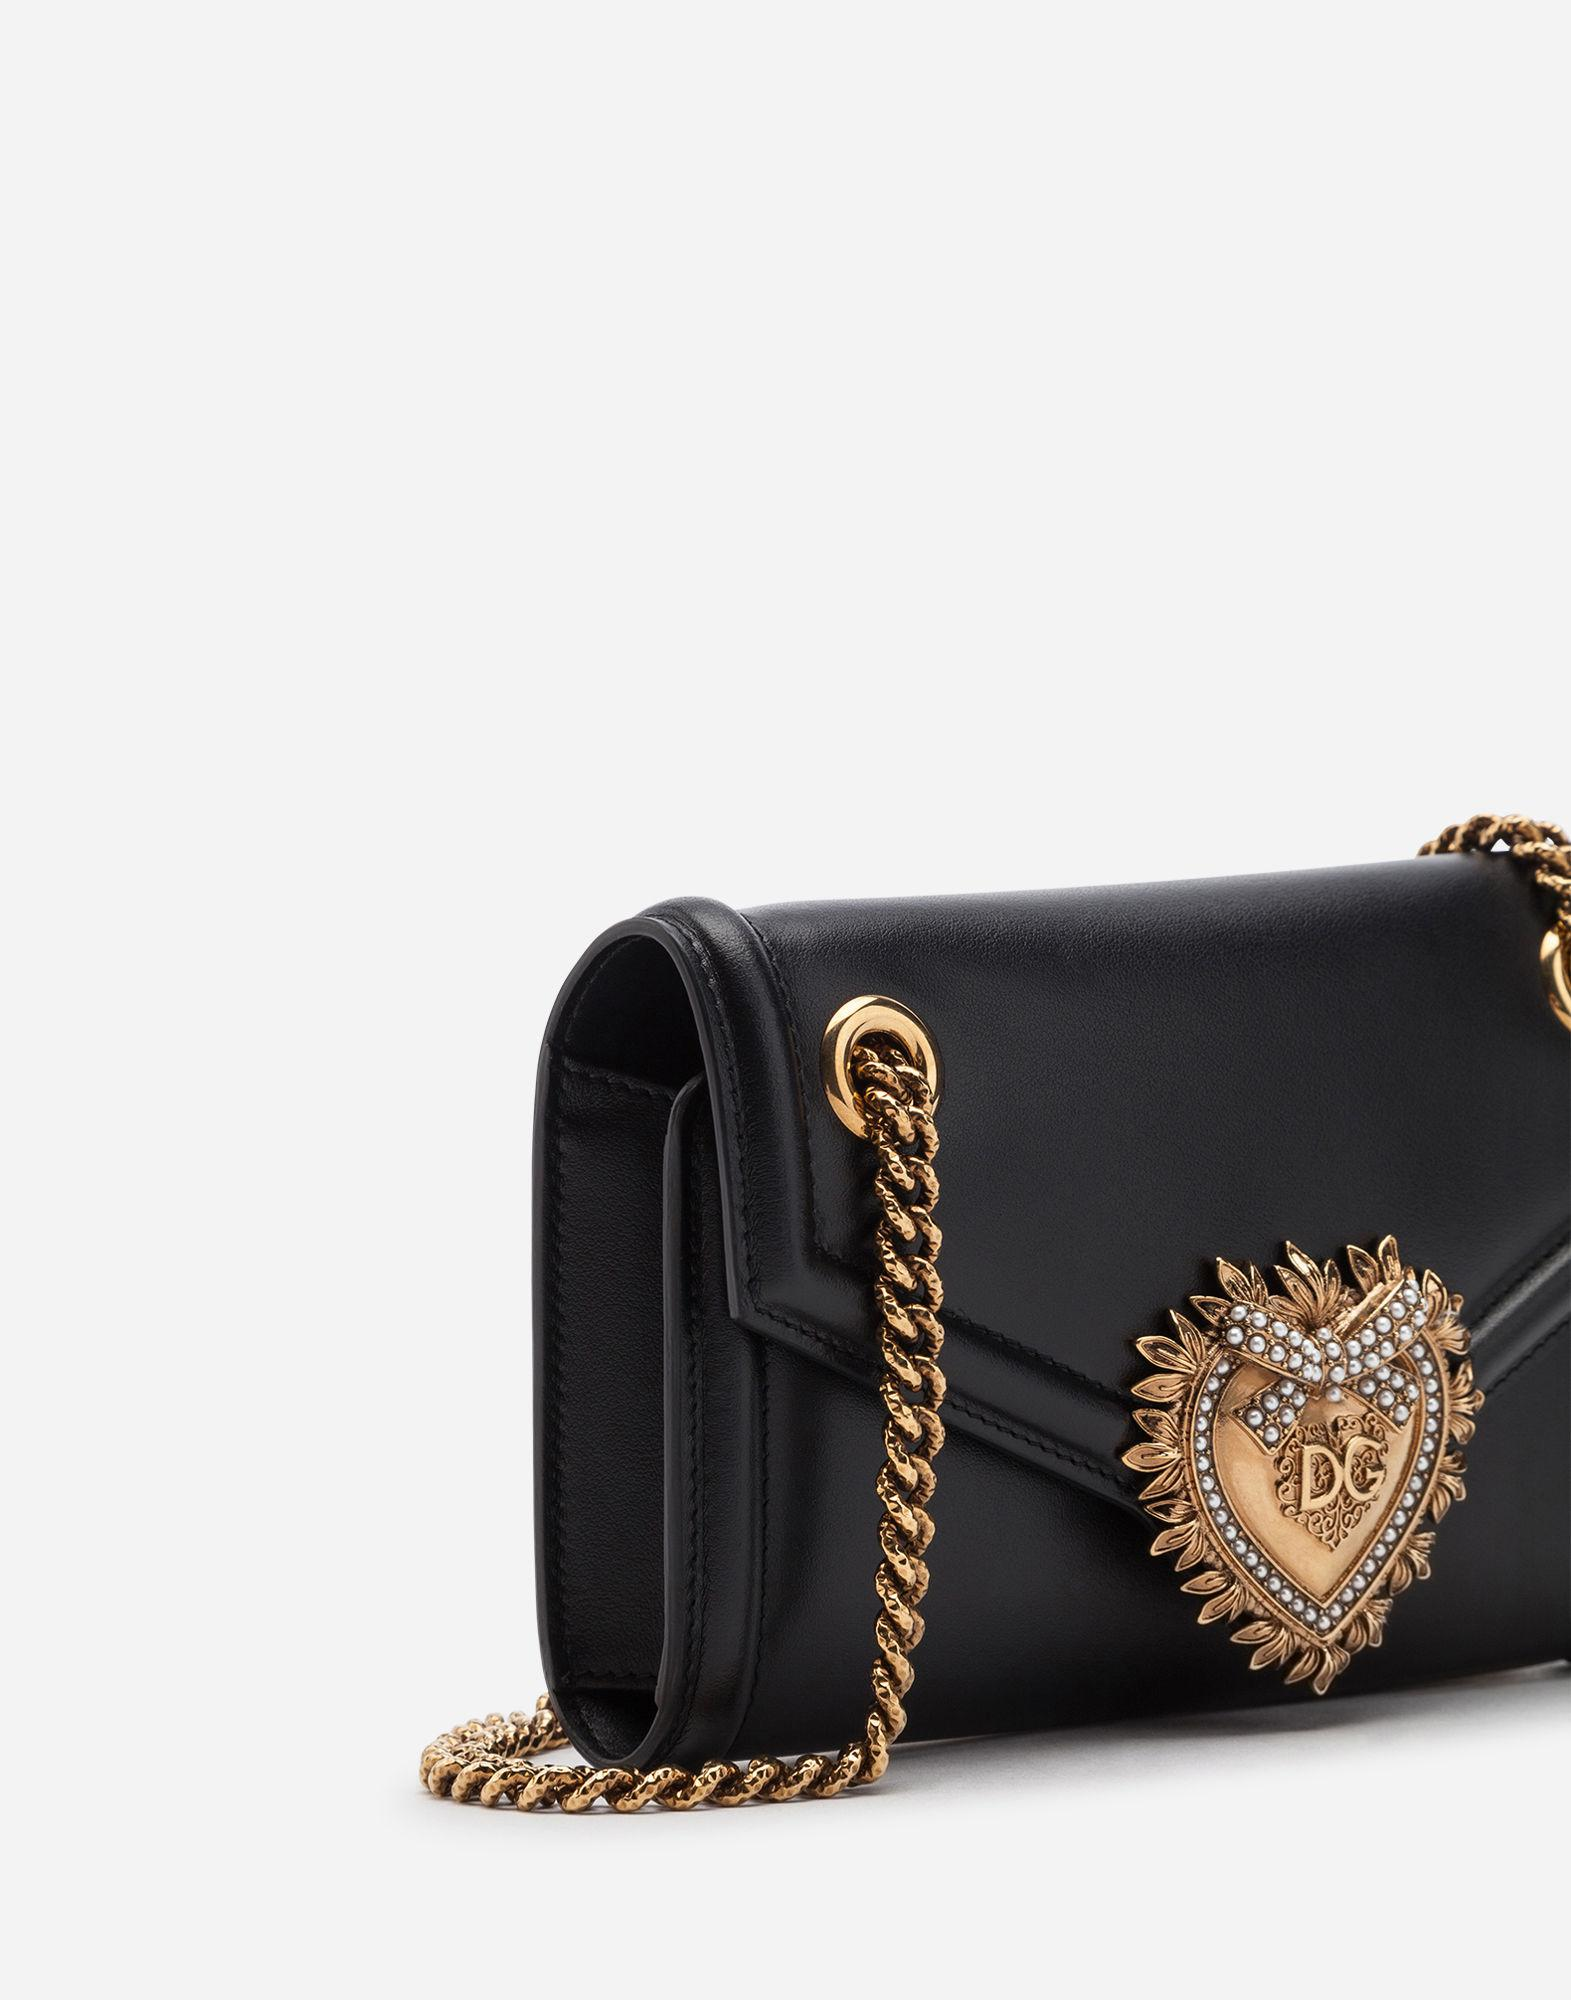 Lyst - Dolce   Gabbana Medium Devotion Bag In Smooth Calfskin Leather in  Black - Save 23% c5305fab1d1b1